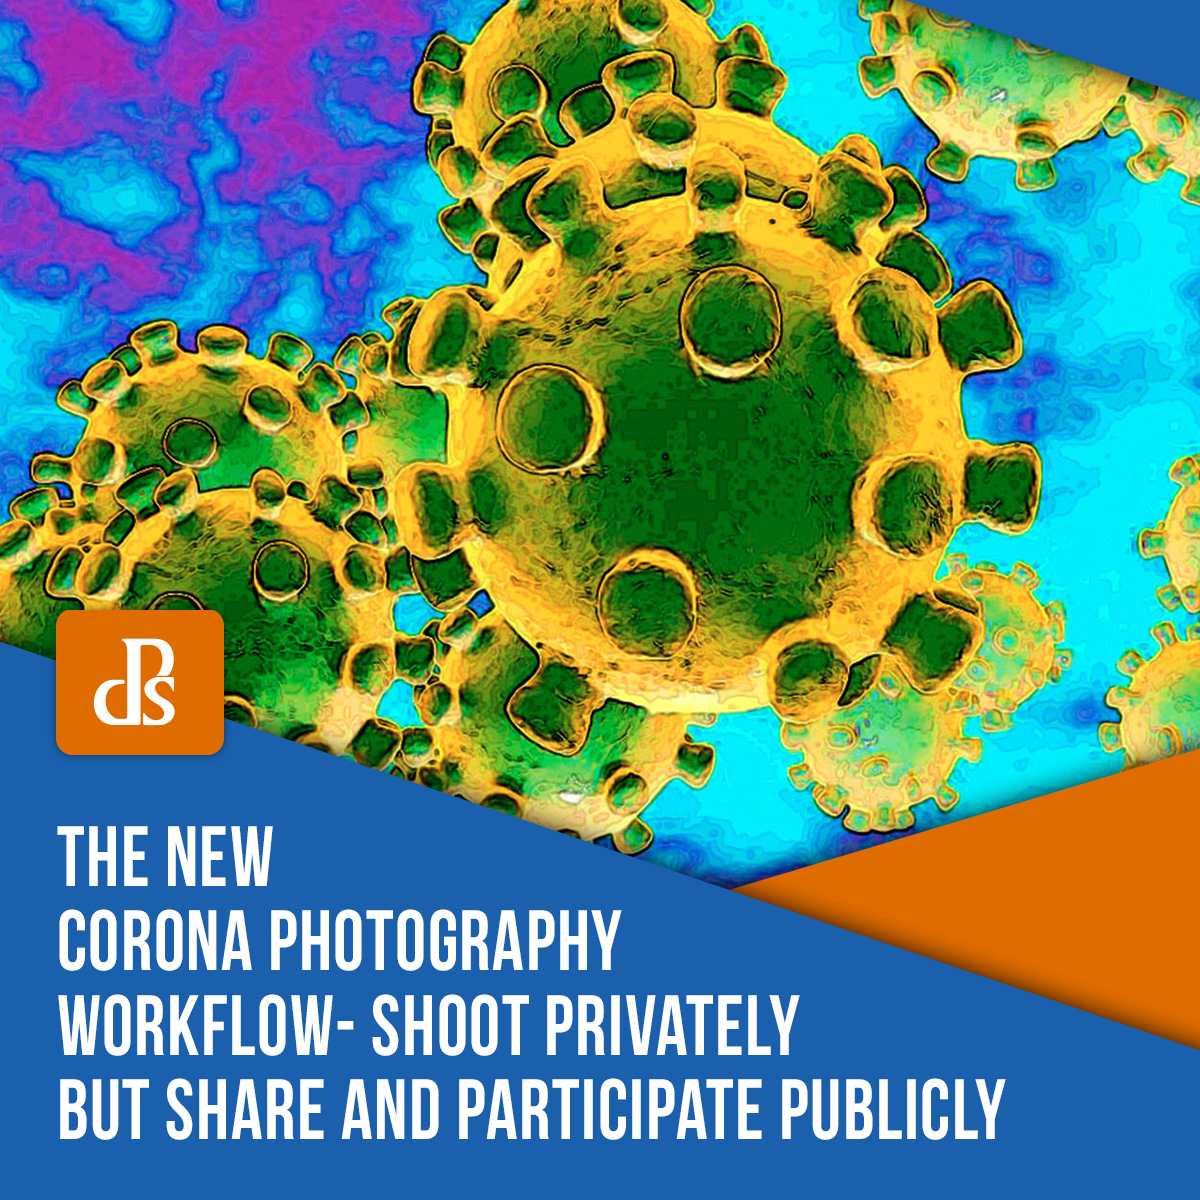 dps-corona-photography-workflow